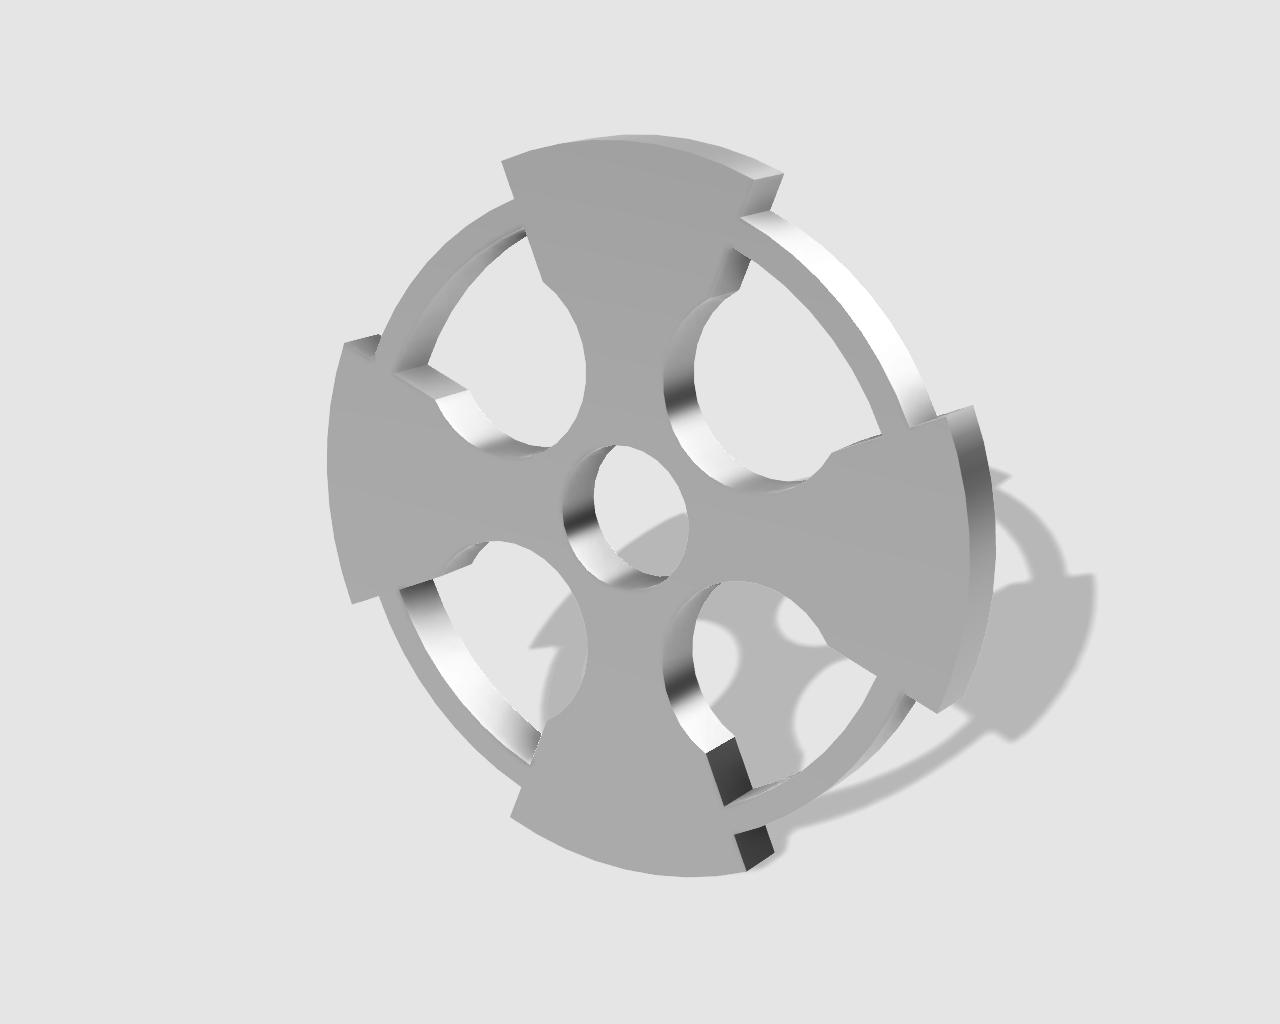 45rpm adaptor - celtic cross